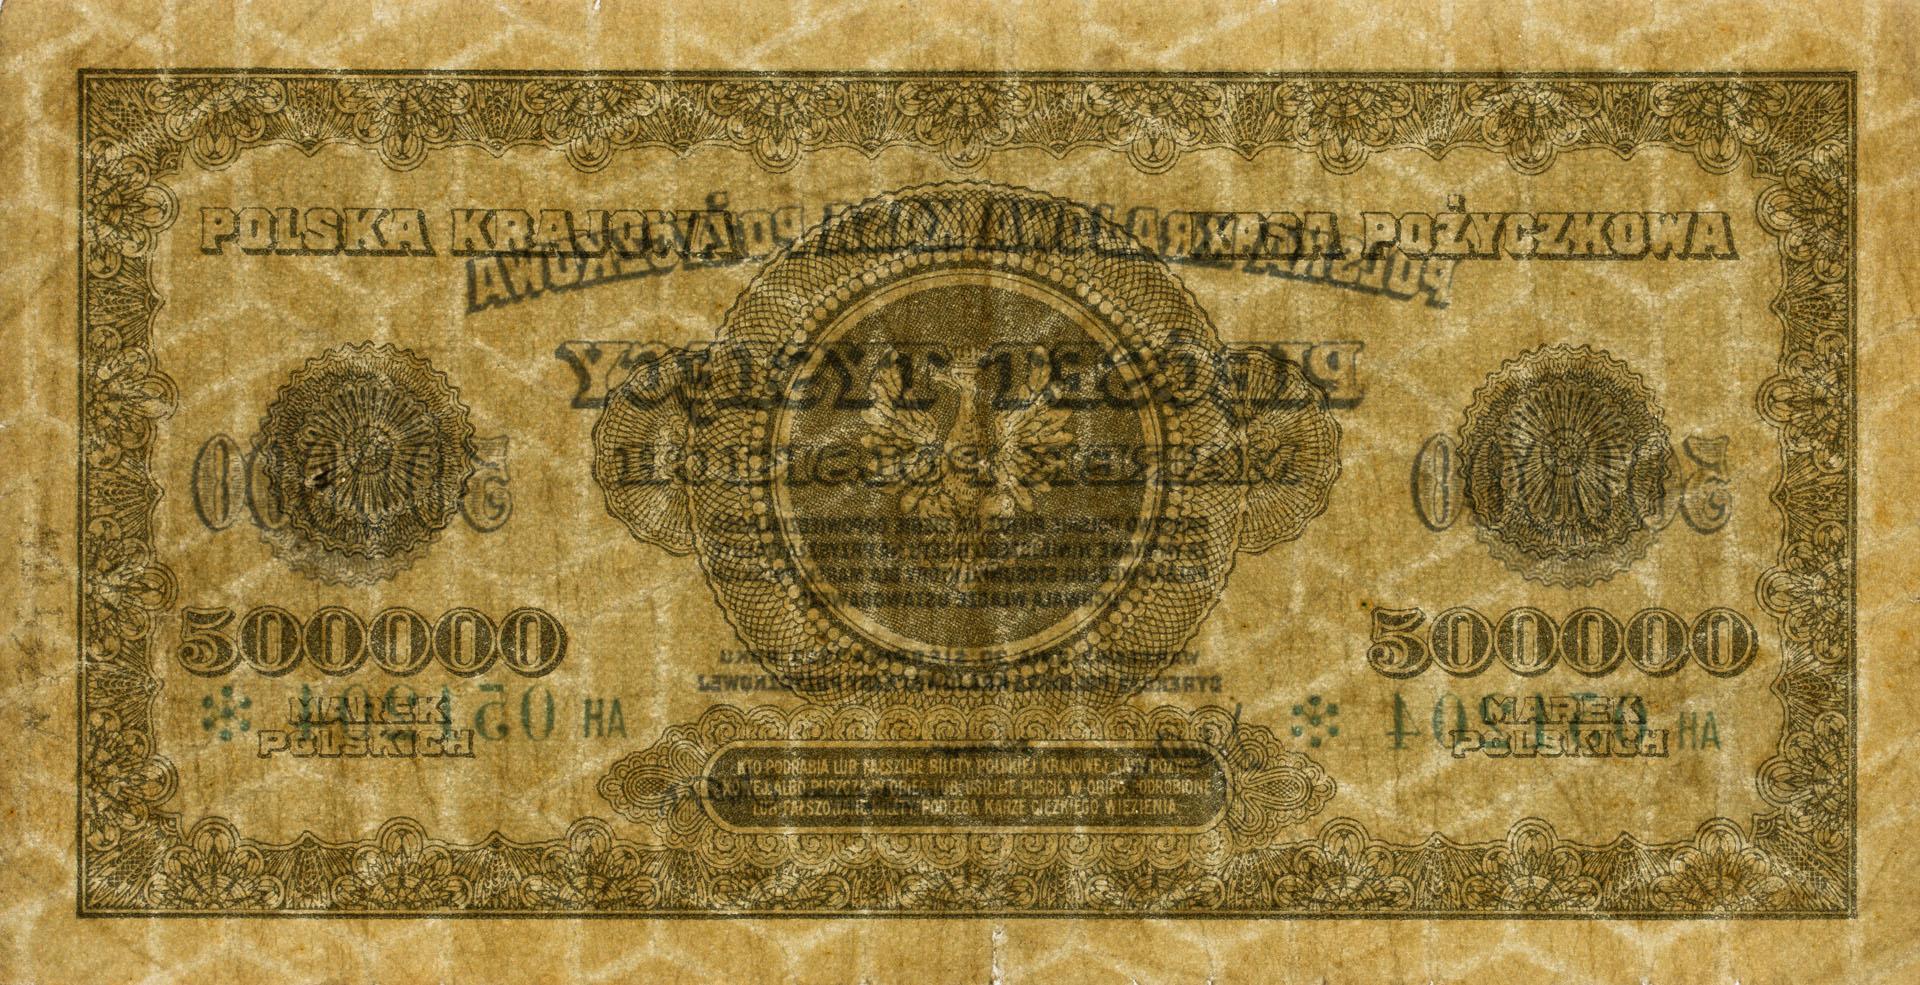 Banknot 500000 marek polskich